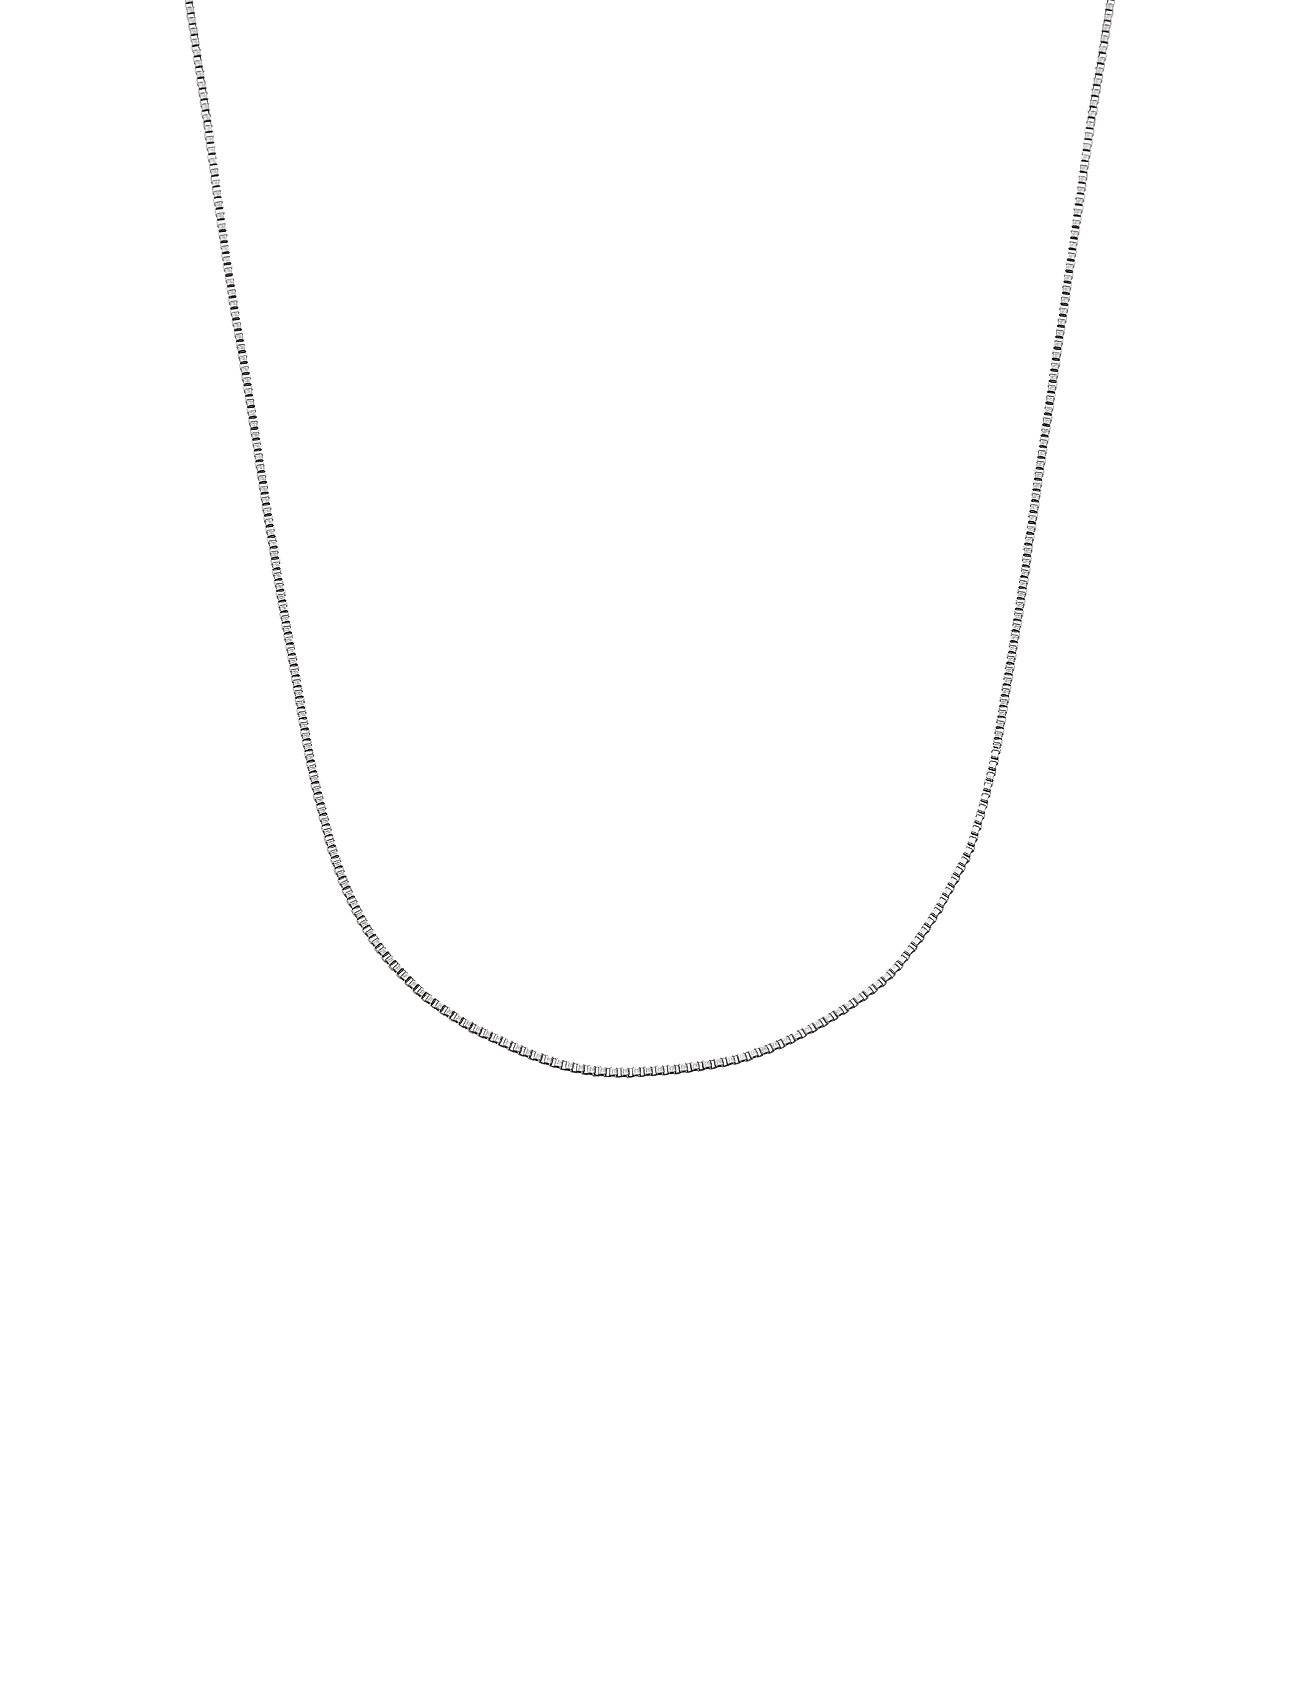 Edblad Charmentity Chain Box 40 Cm Steel Accessories Jewellery Necklaces Dainty Necklaces Hopea Edblad